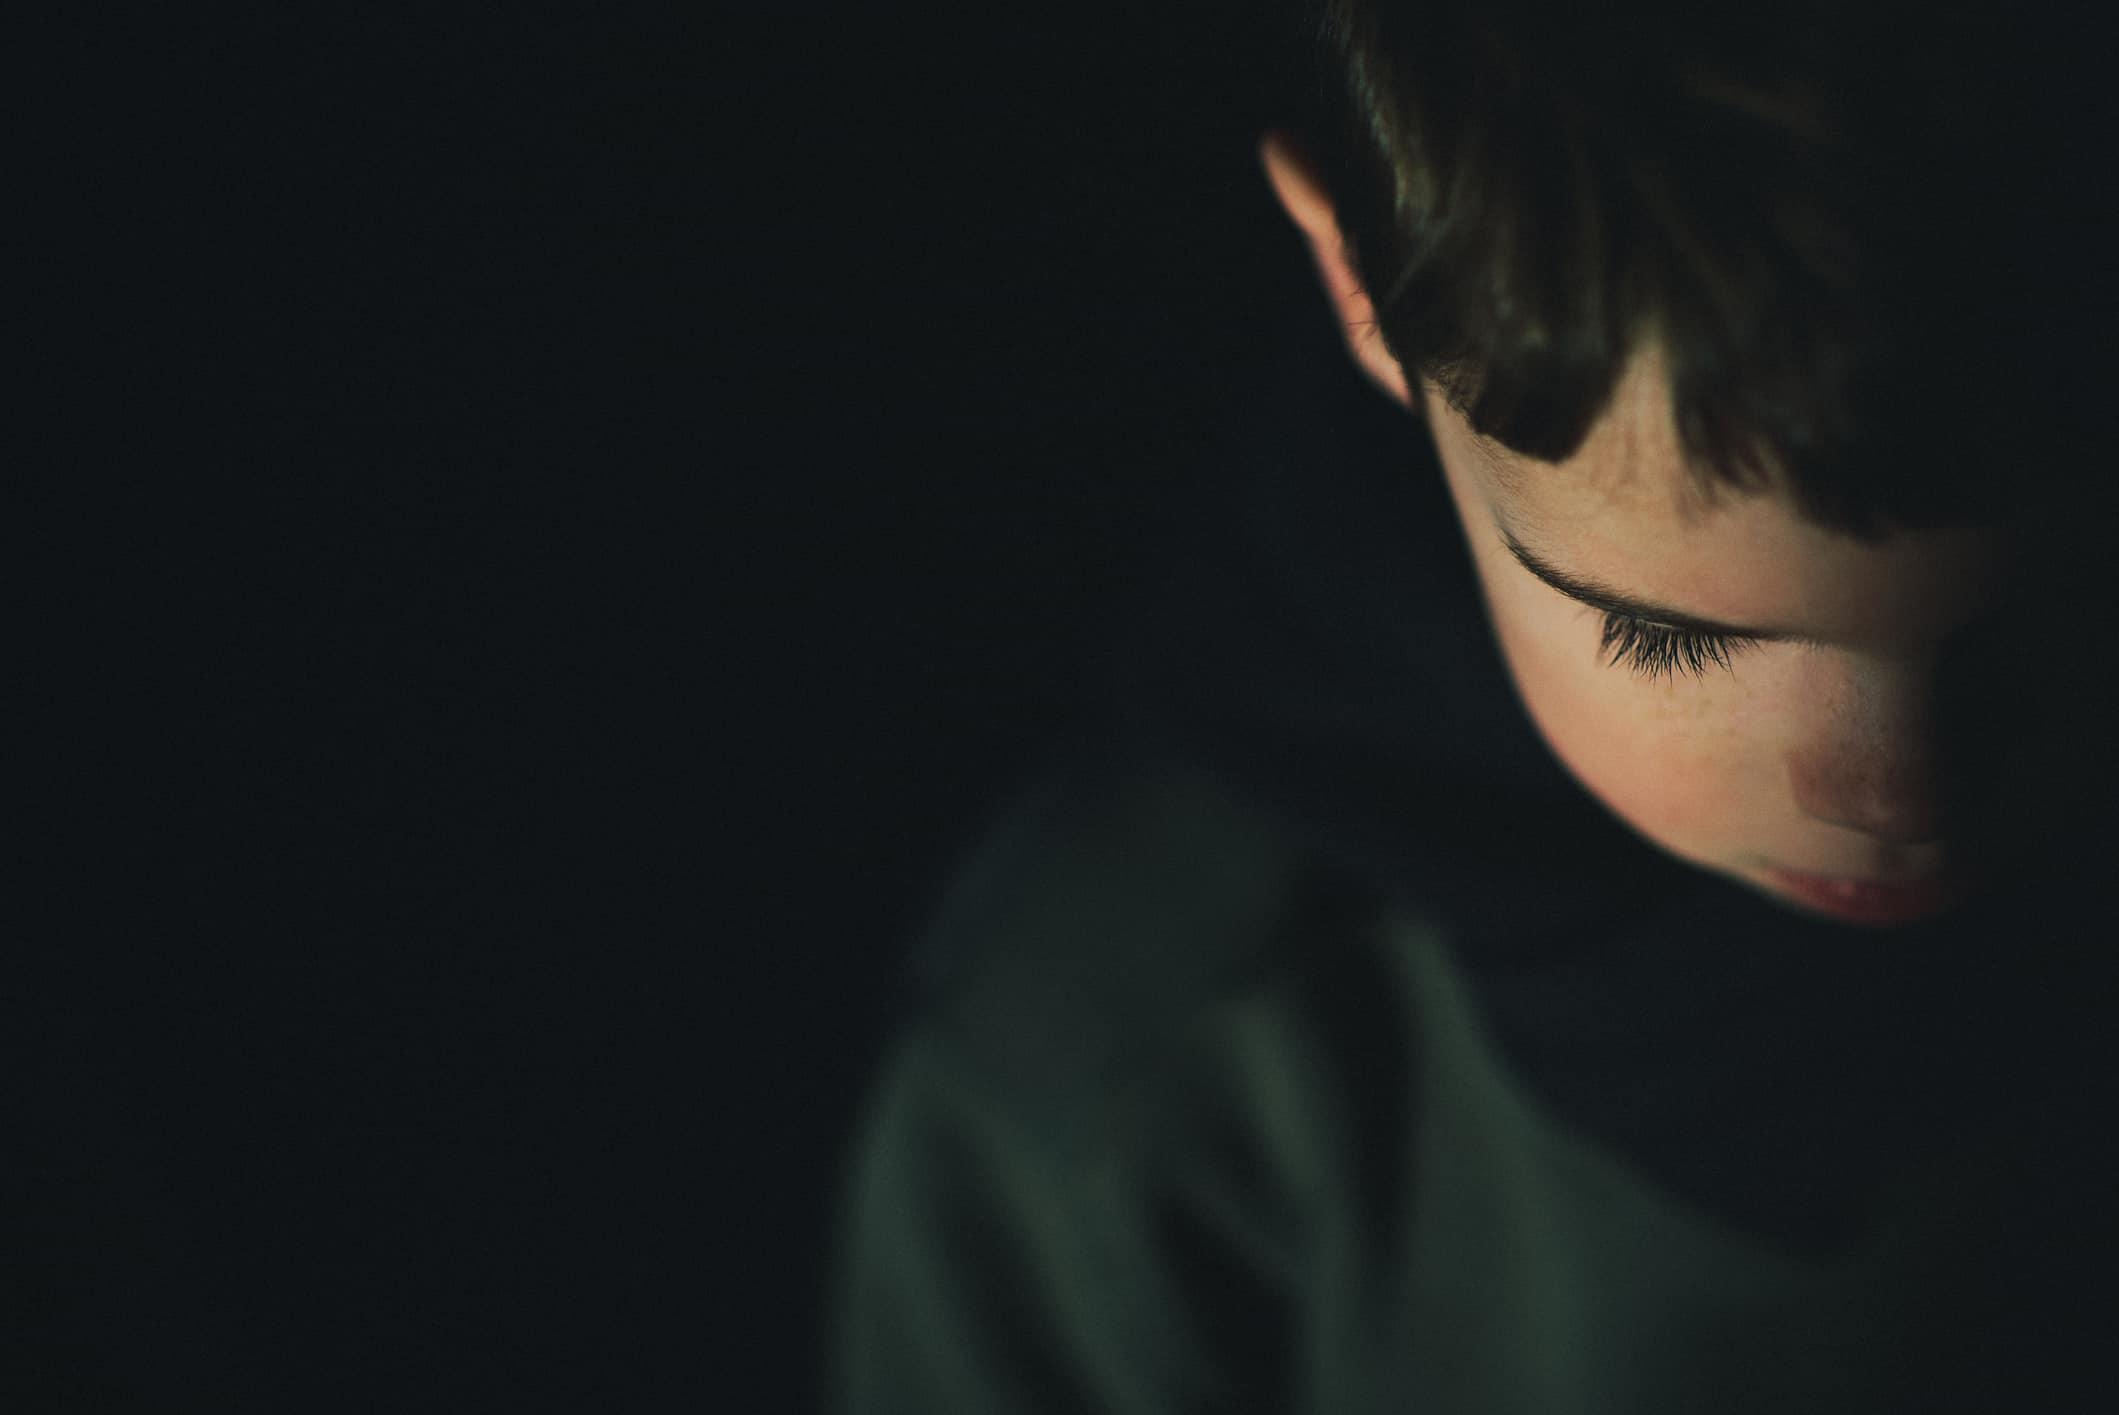 crianca no escuro